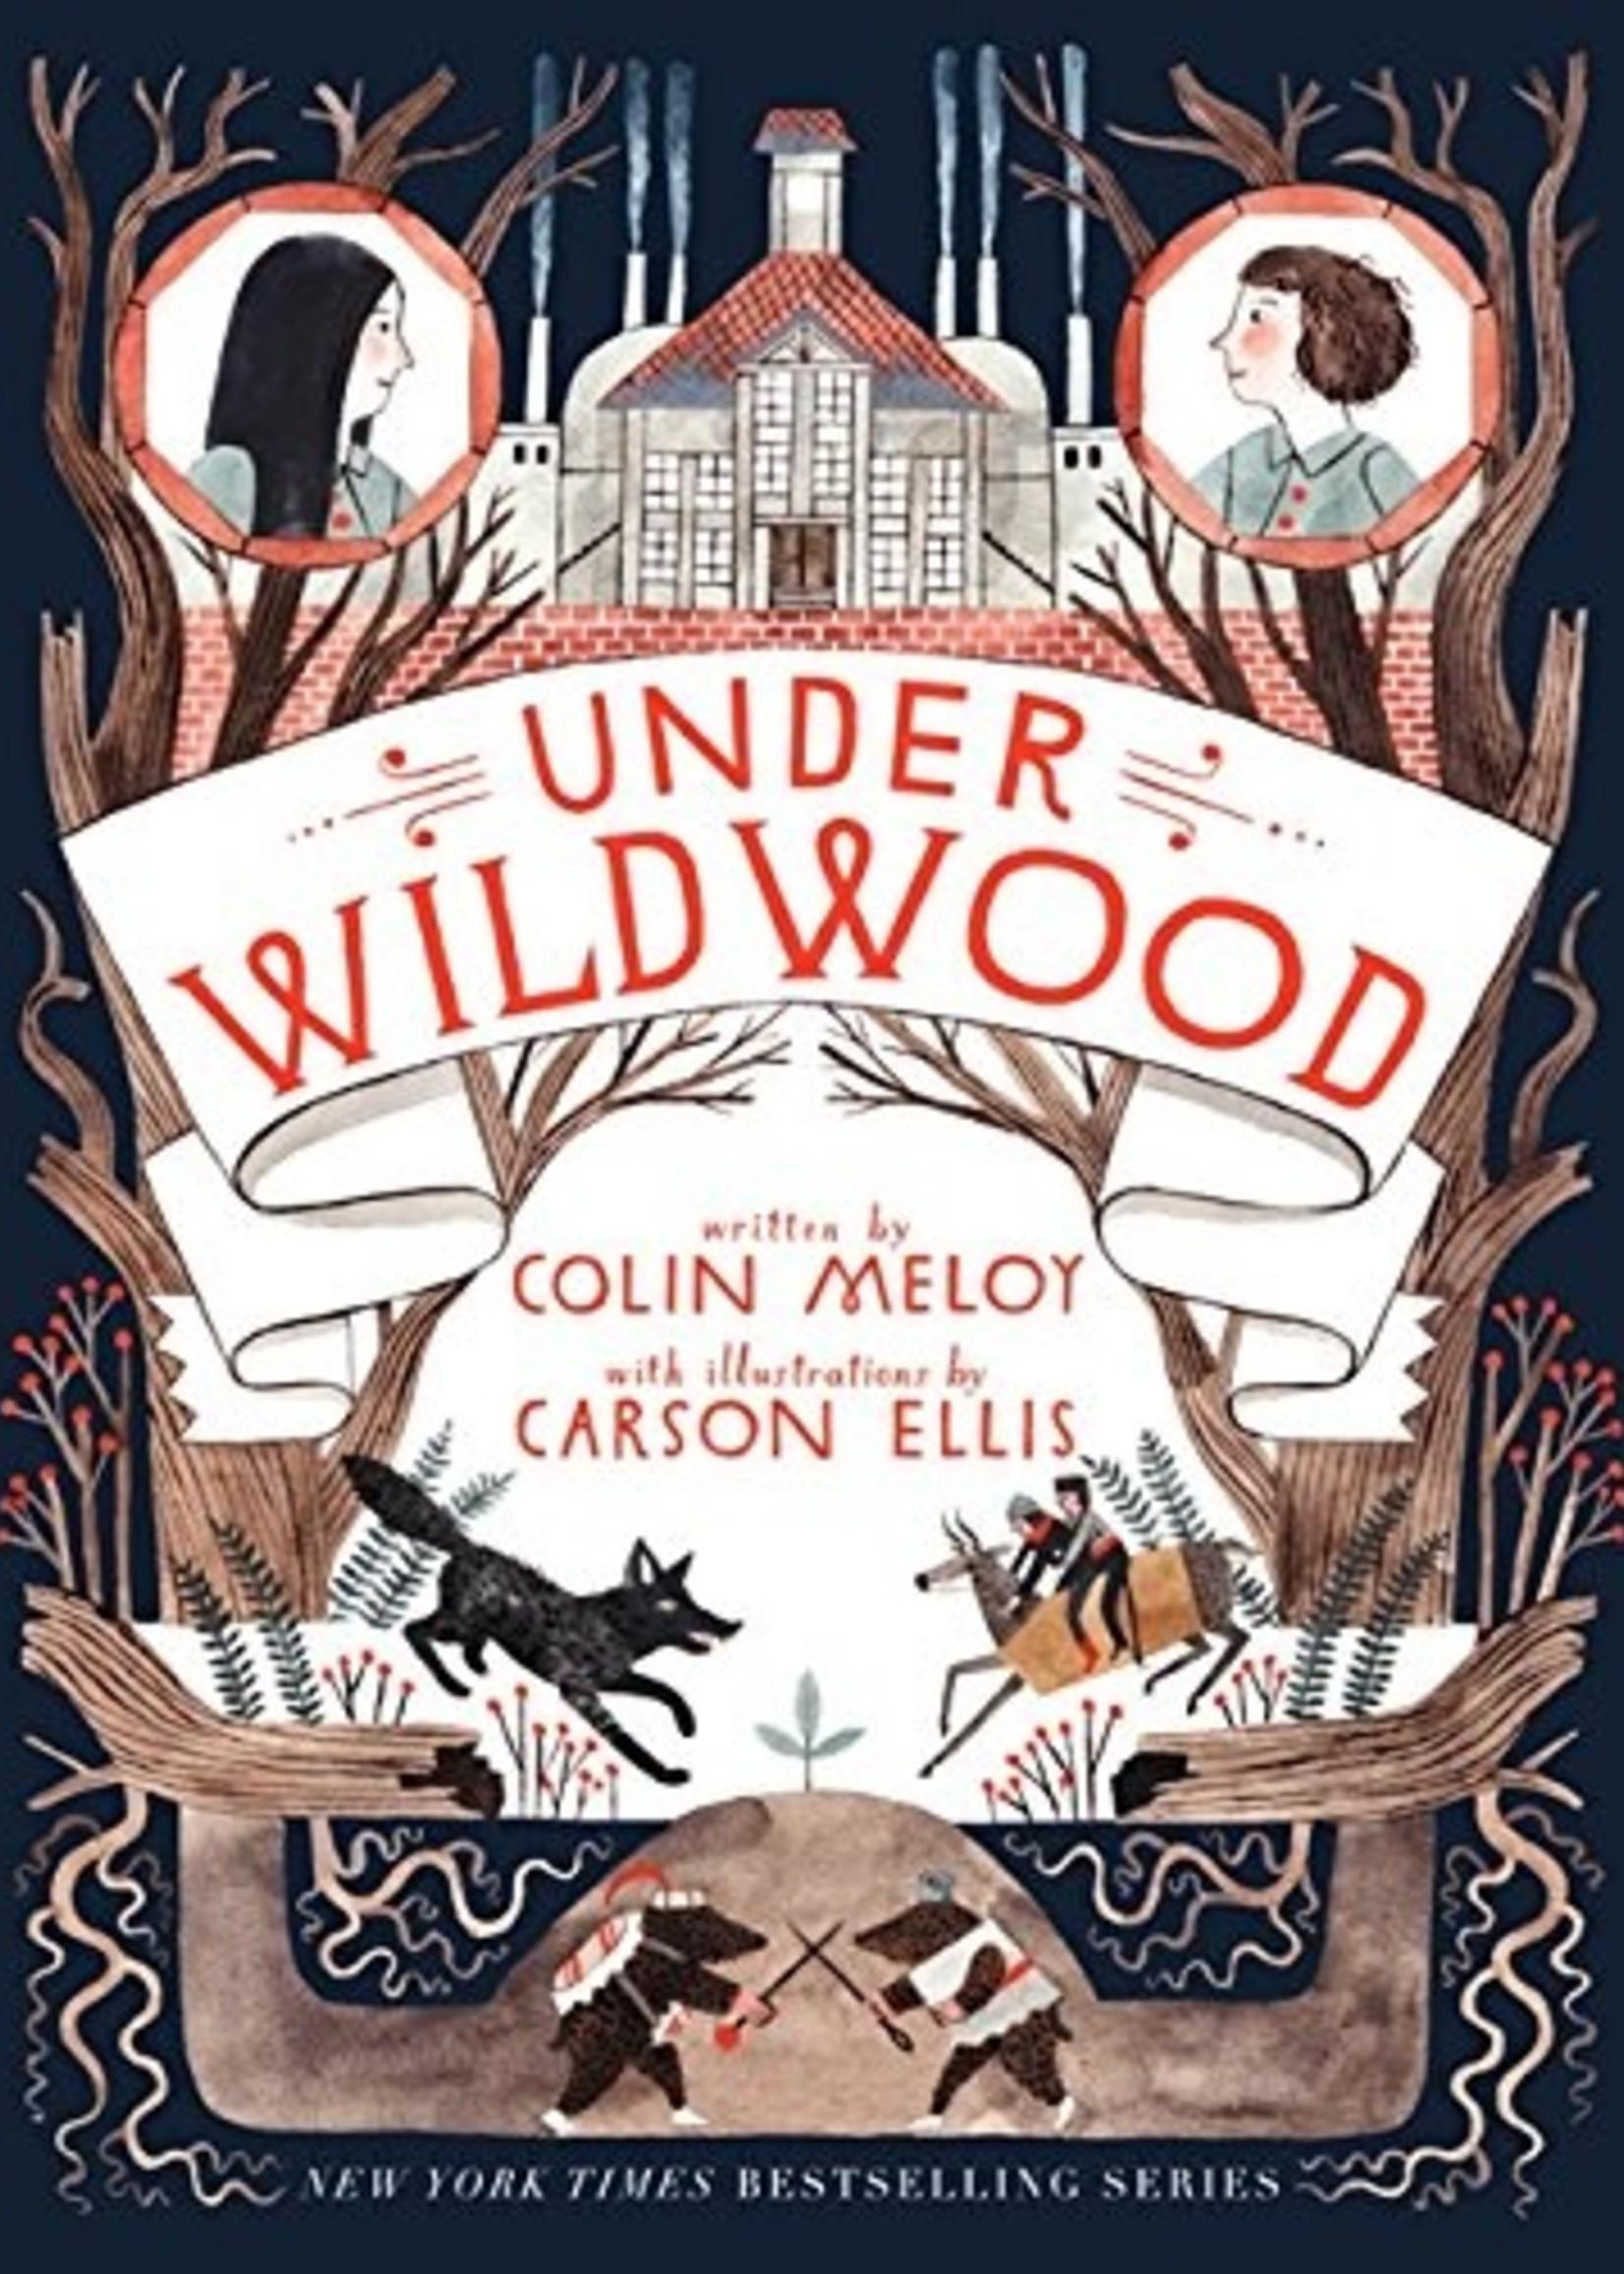 Wildwood Chronicles #02, Under Wildwood - Paperback